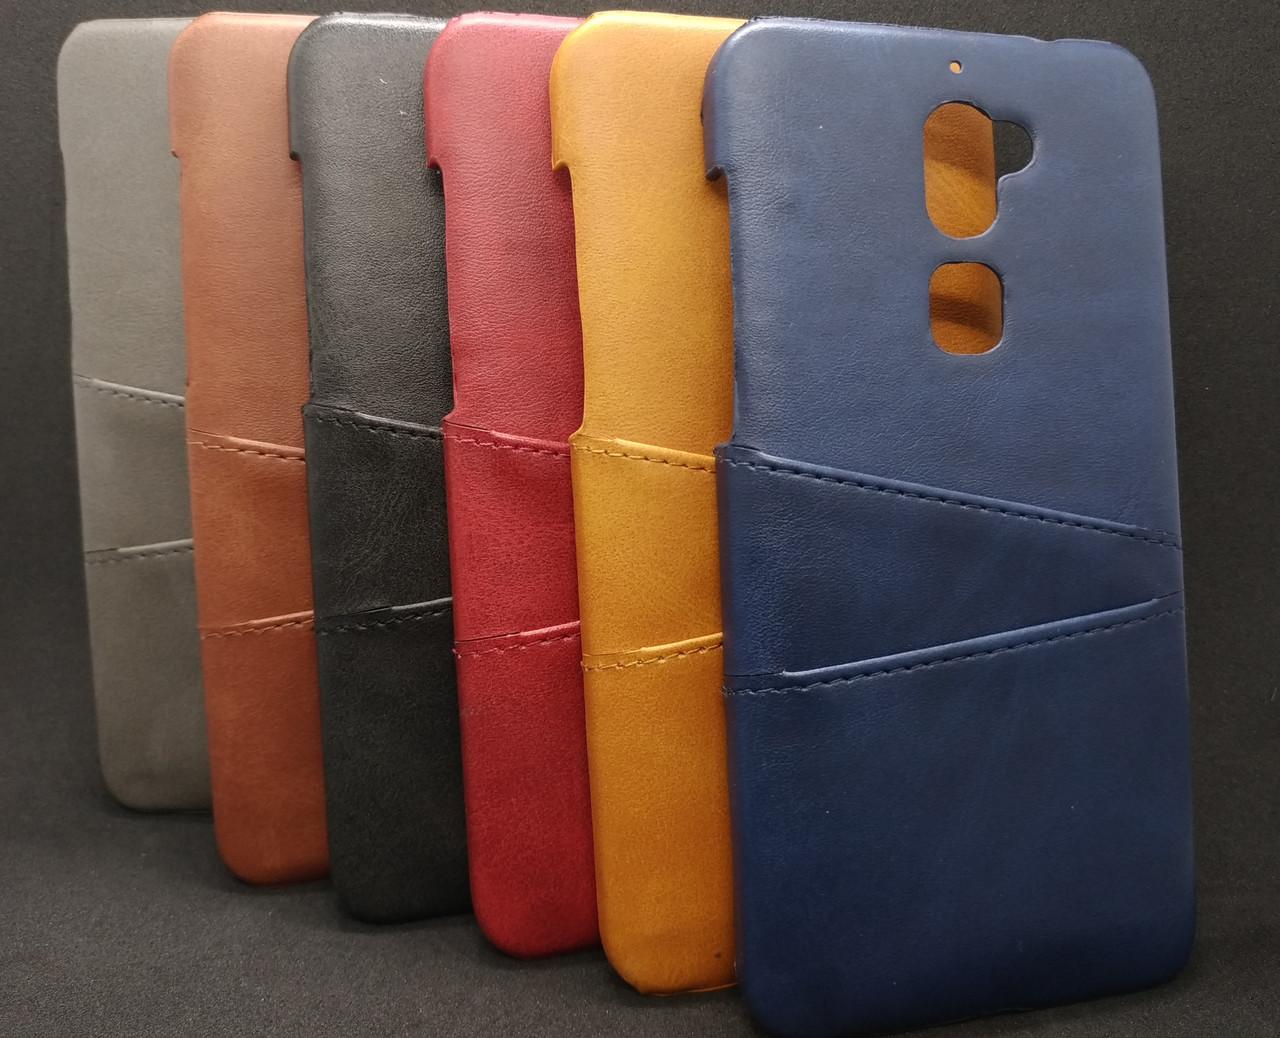 Кожаный чехол с карманами для LeEco Cool1 / LeRee Le3 /Coolpad/dual/Cool Play 6/ Changer 1C/